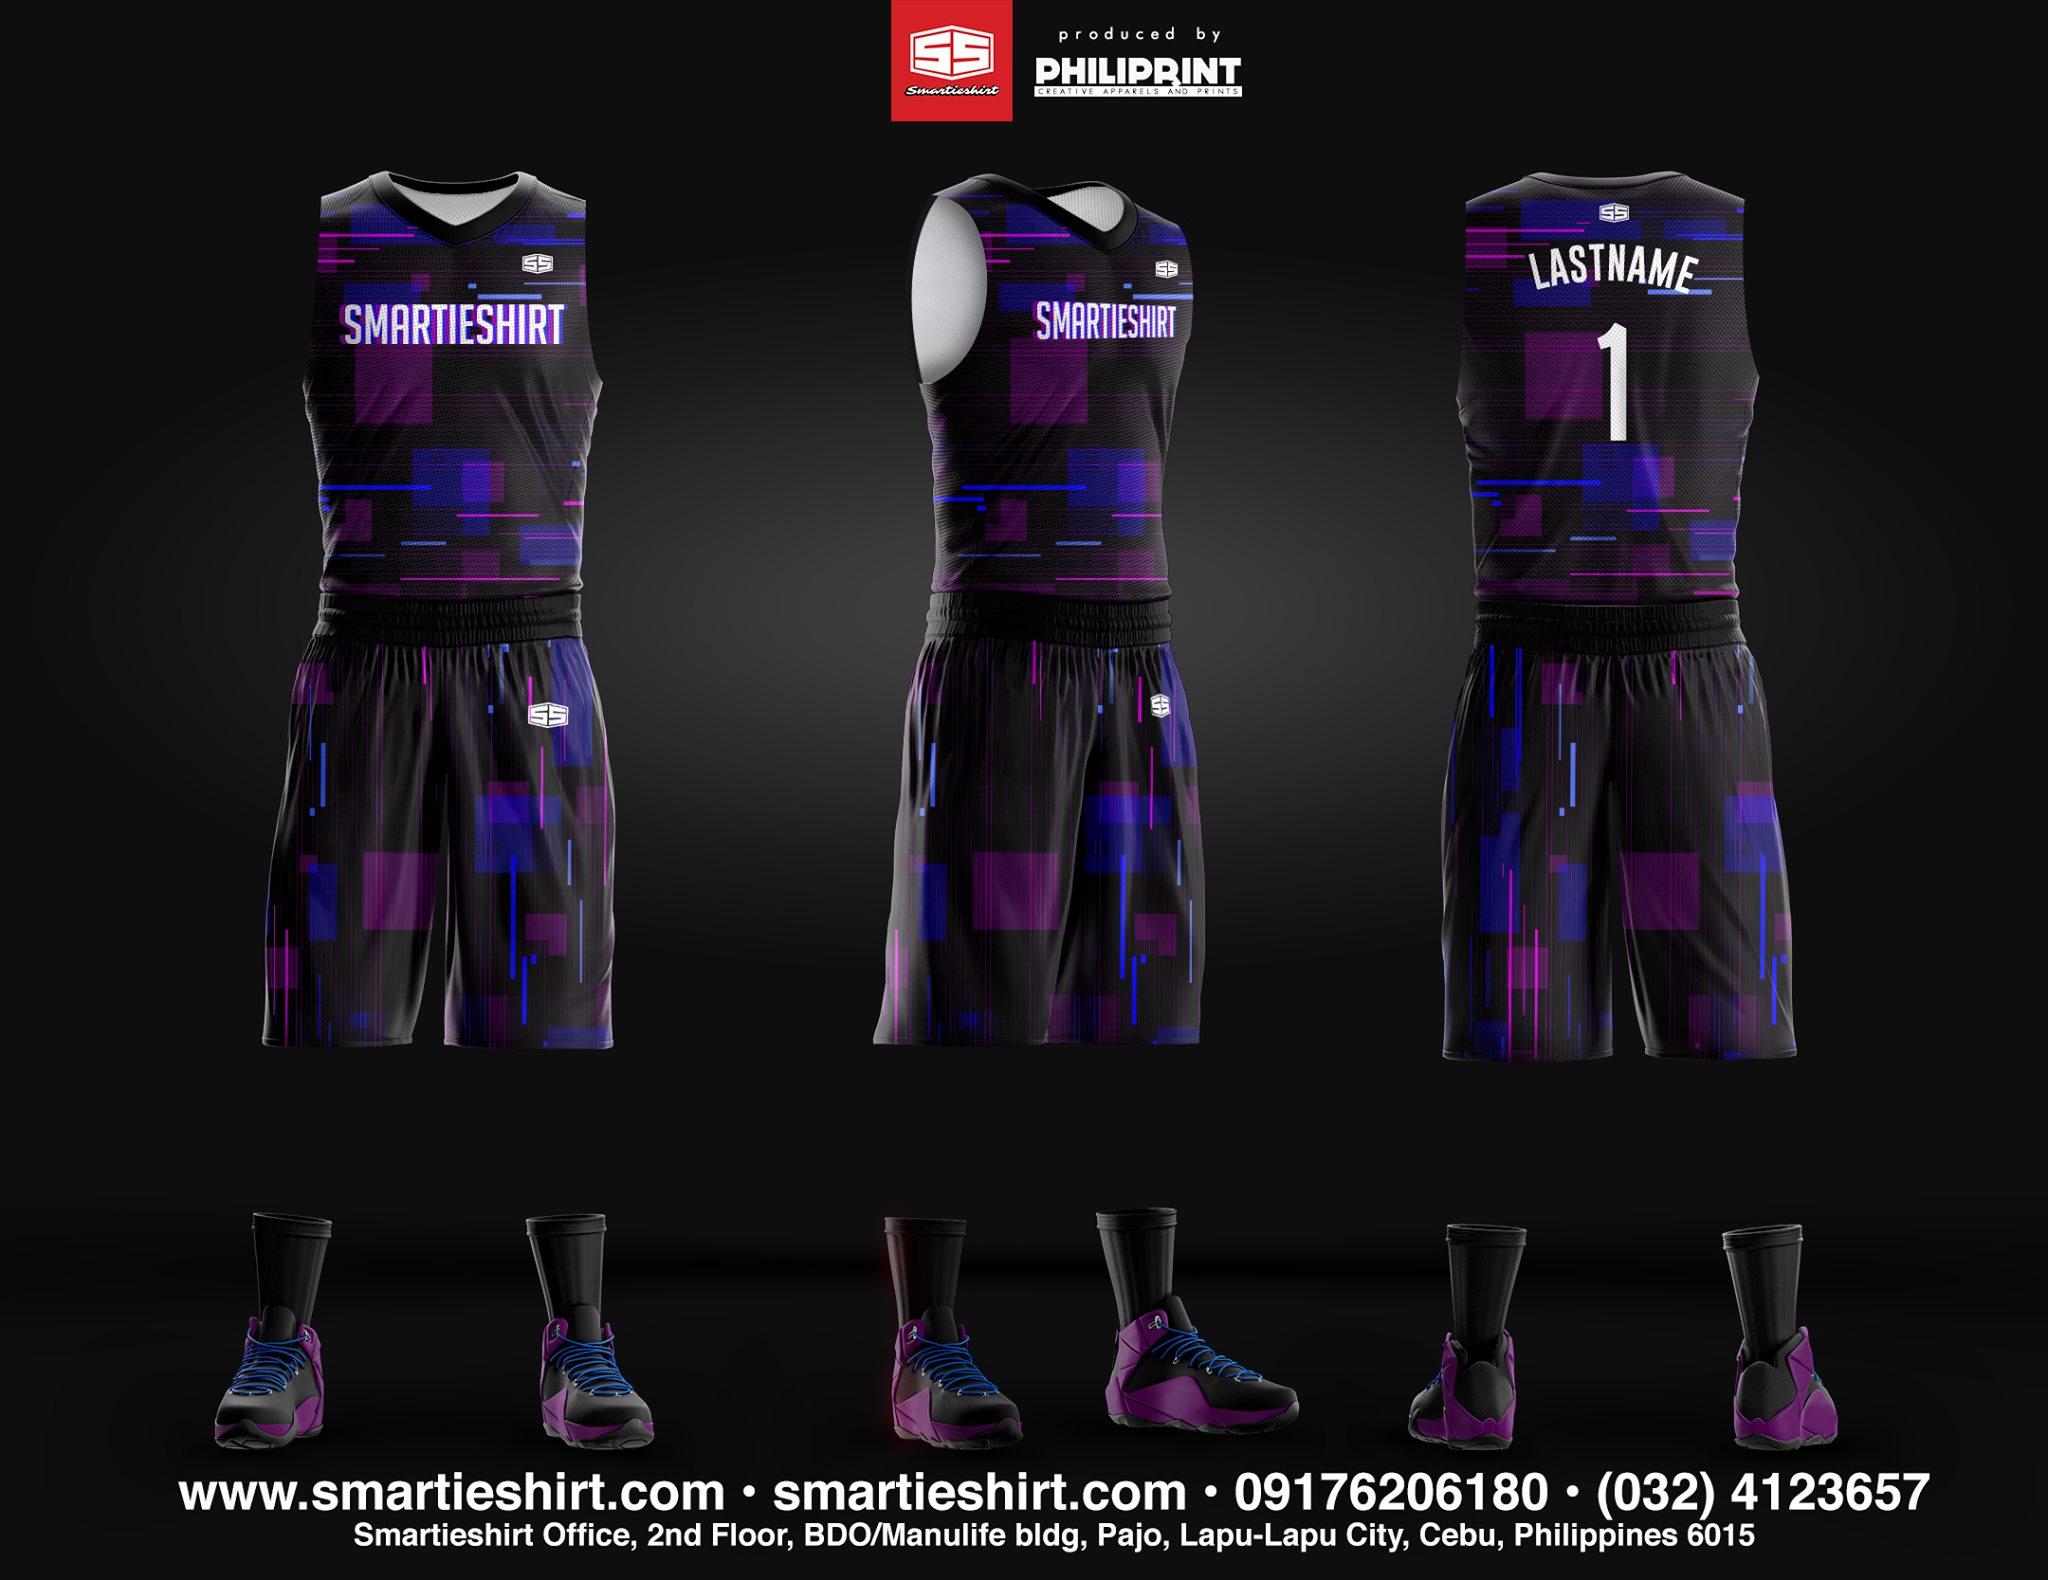 Philiprint Basketball Jersey Full Sublimation Smartieshirt